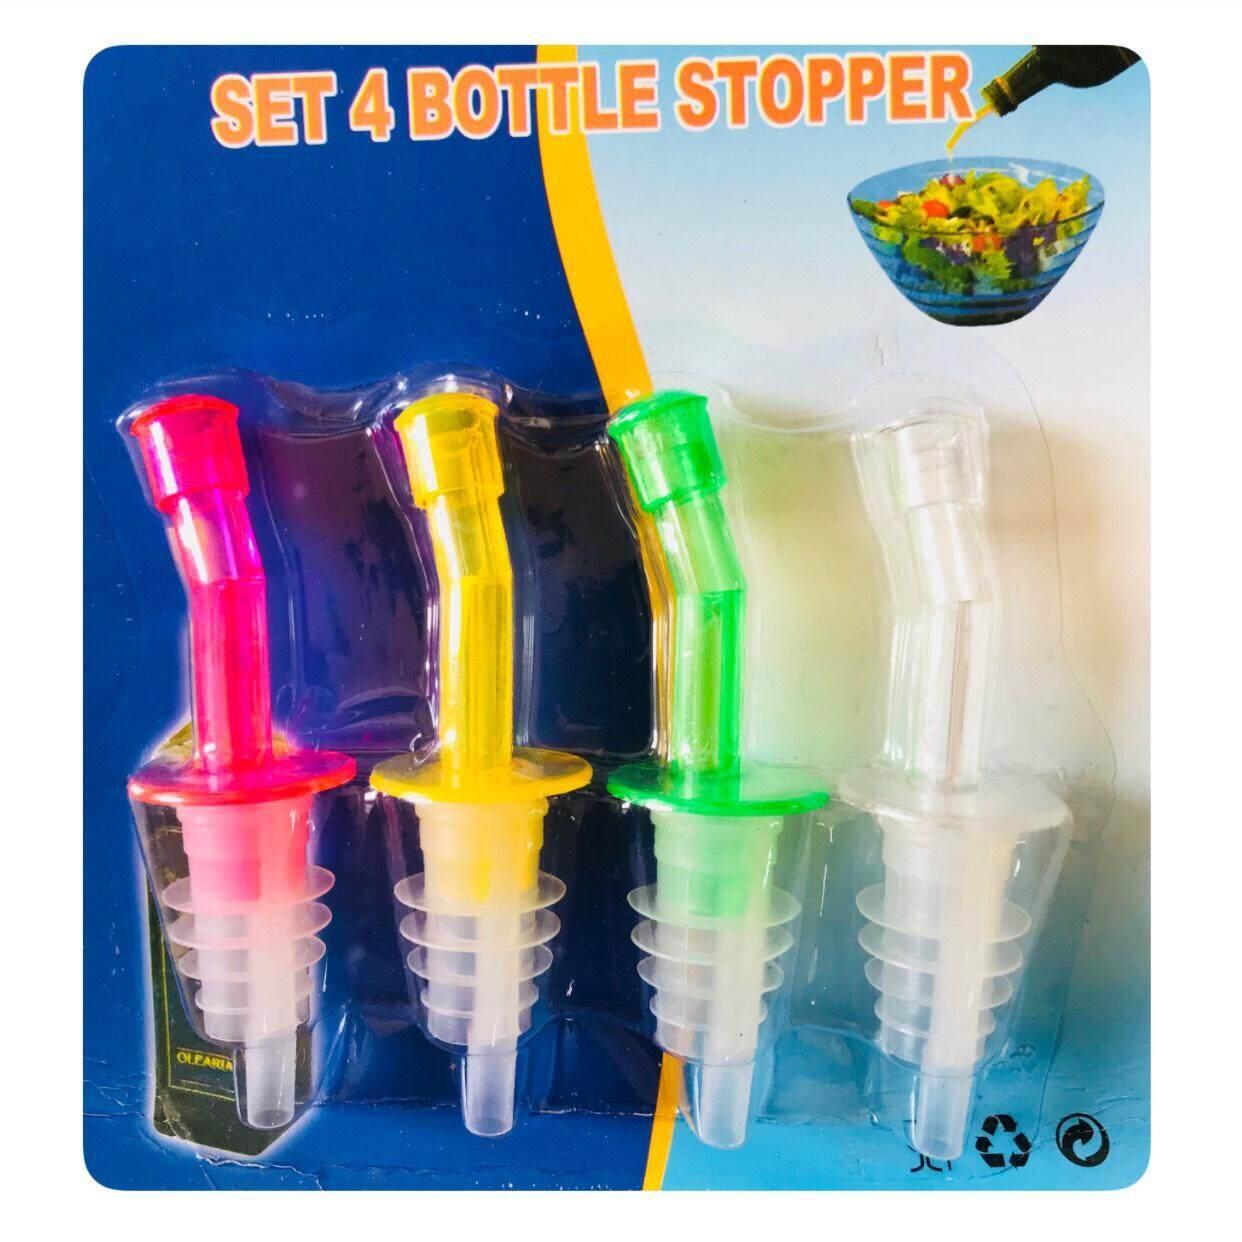 Namita Bottel Stopper อุปกรณ์รินเครื่องดื่ม จุกขวดไวน์